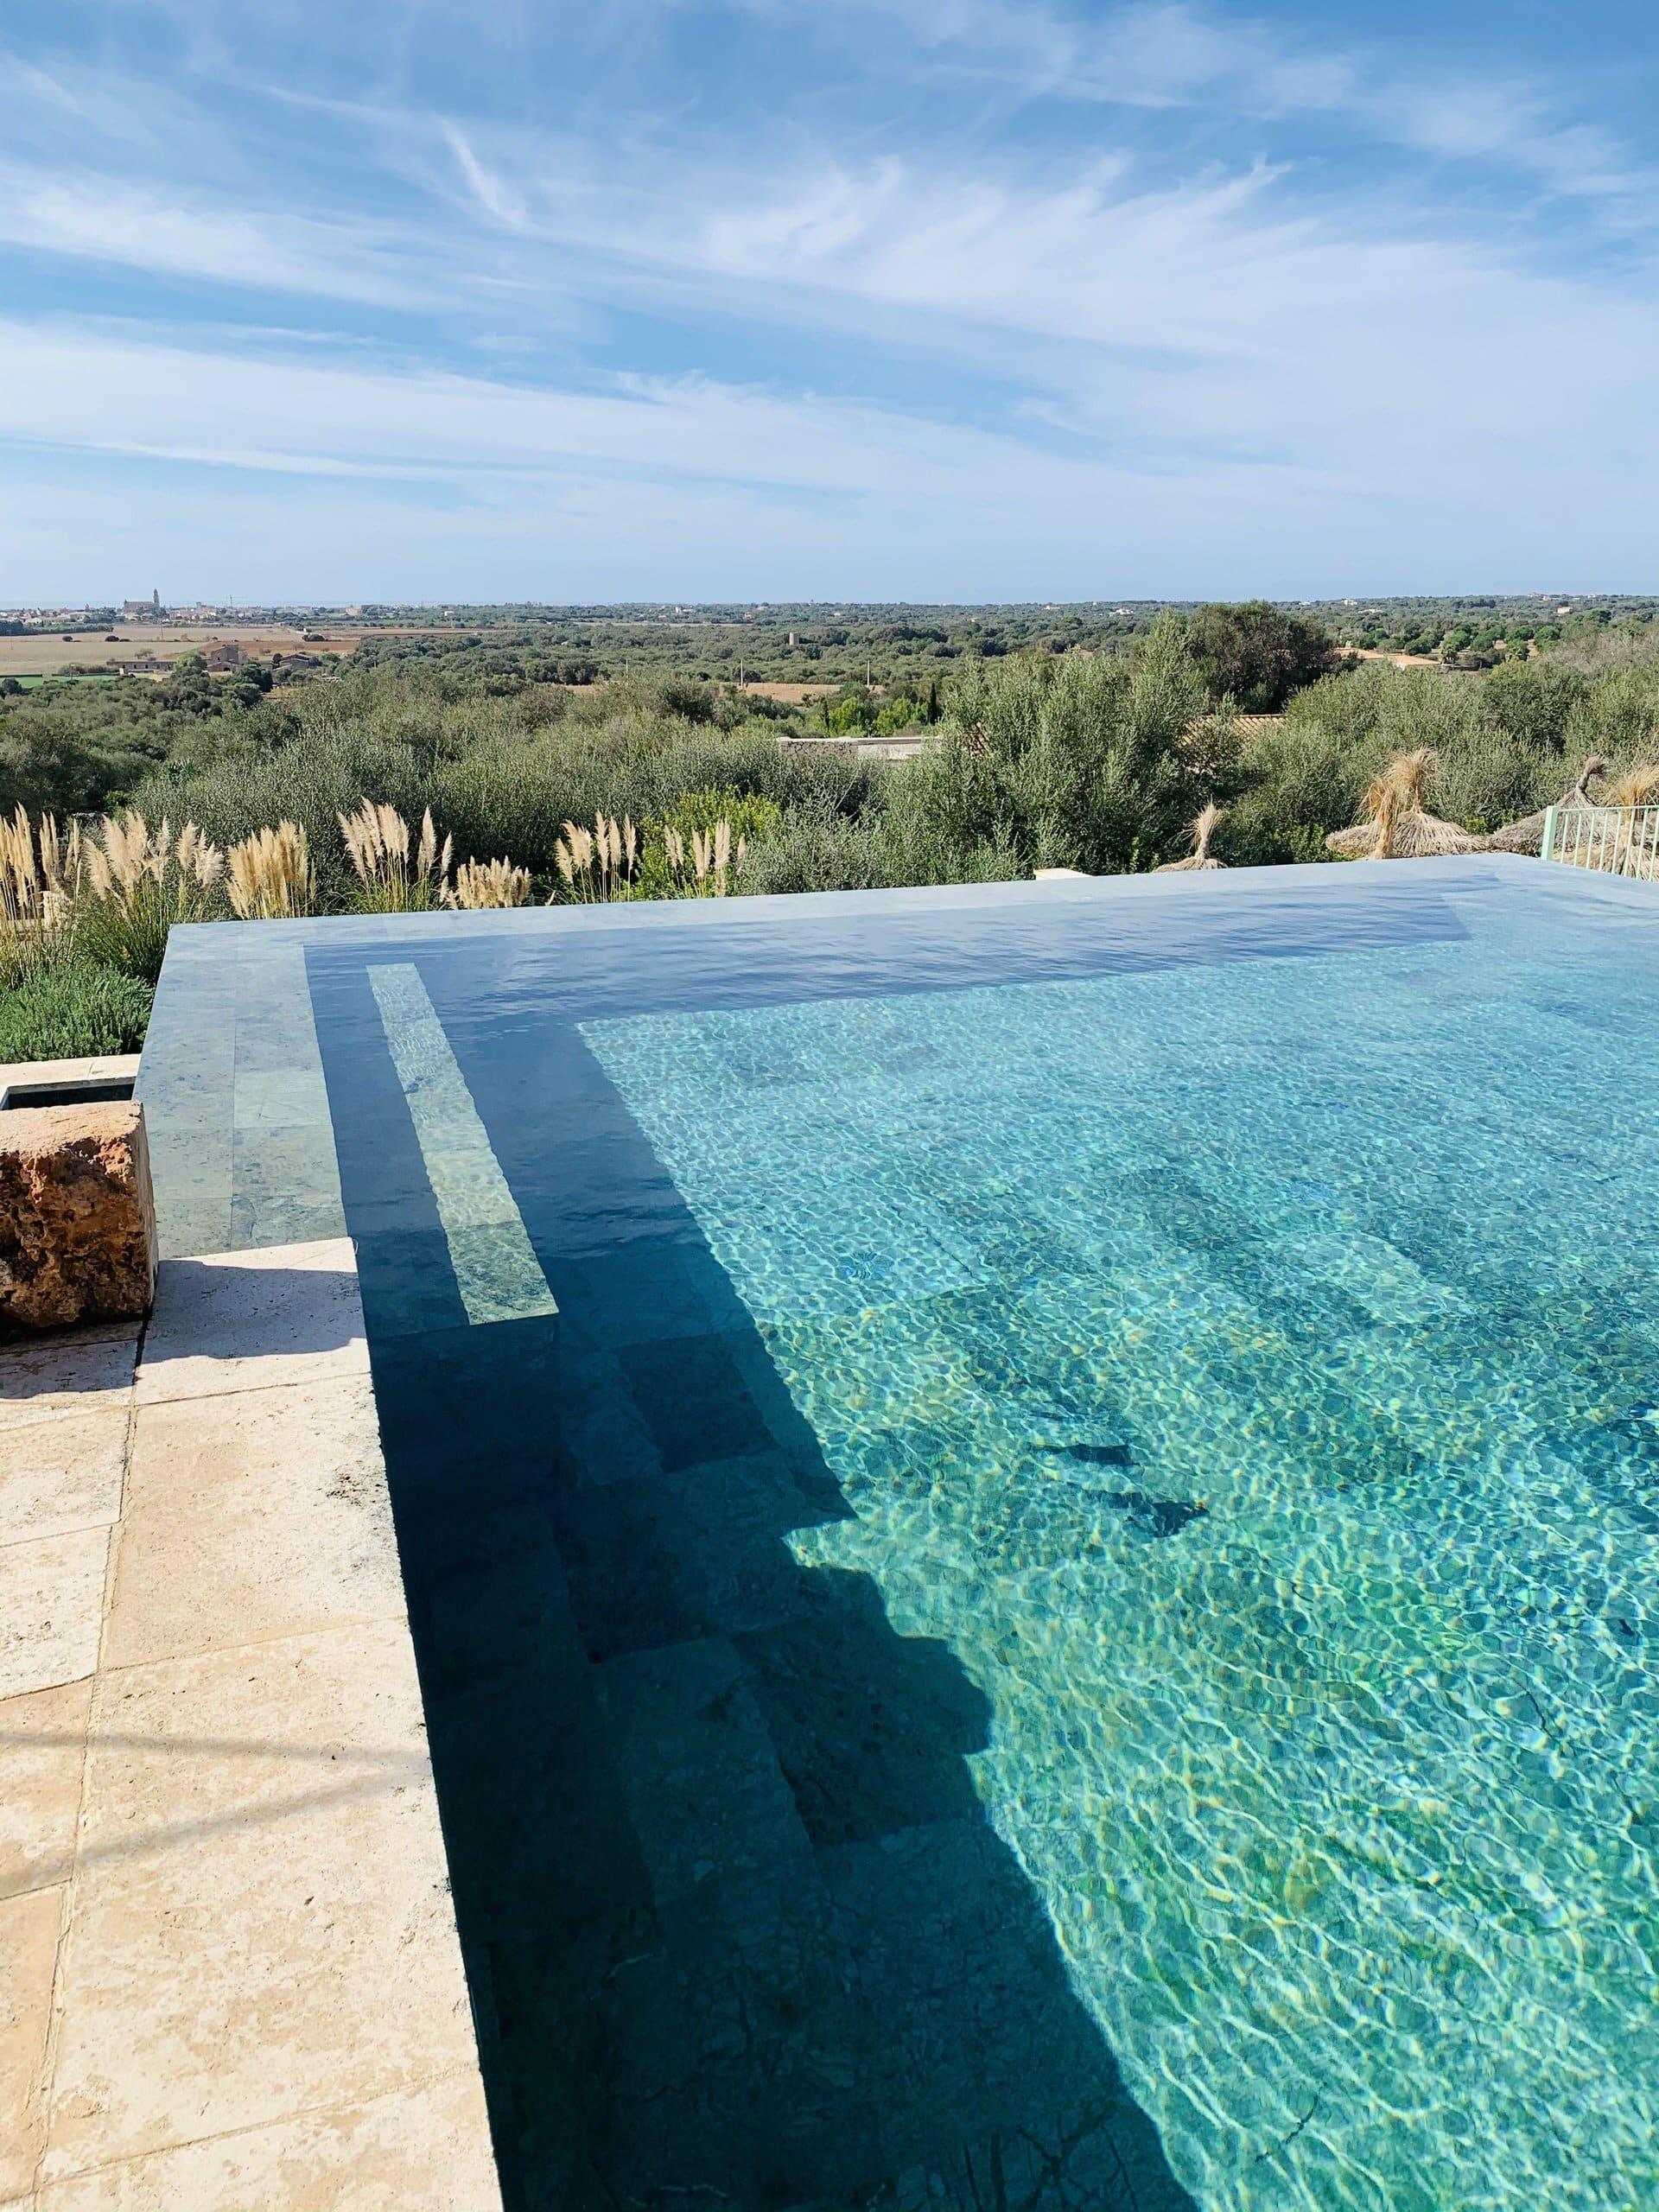 Unser Finca Hotel des Monats – Hotel Rural Es Turo